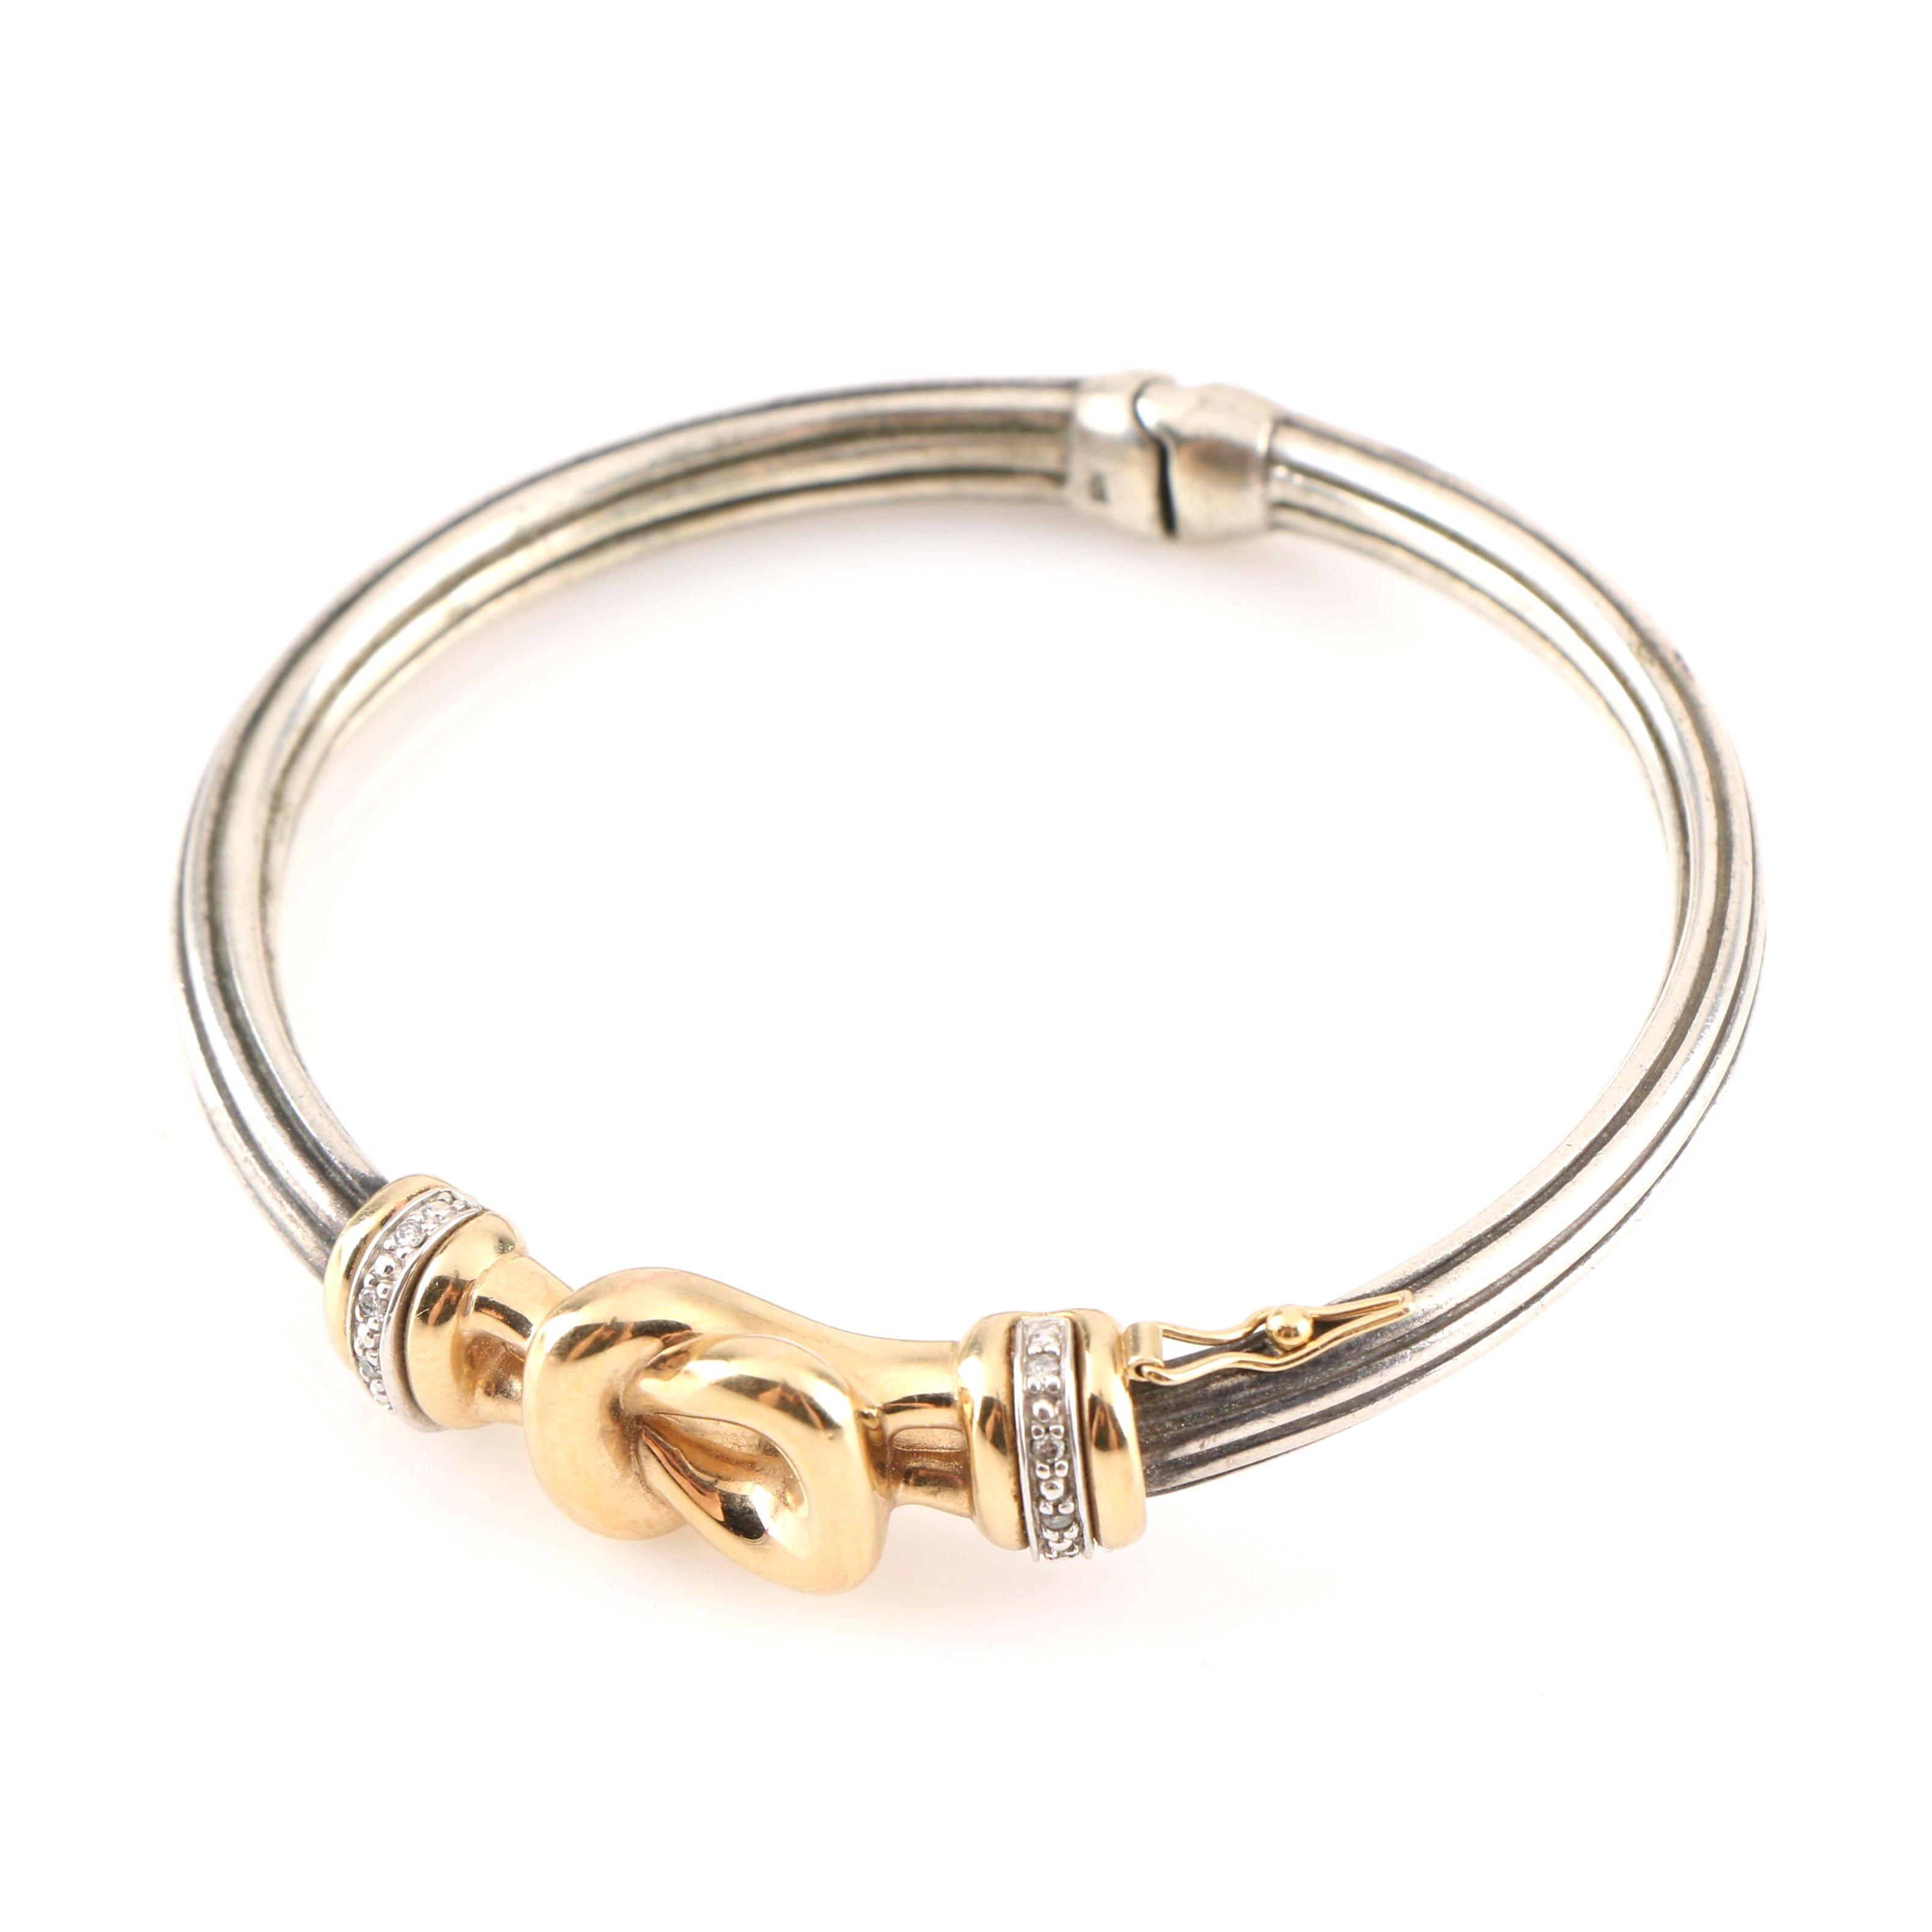 Sterling Silver and 14K Yellow Gold Diamond Bangle Bracelet